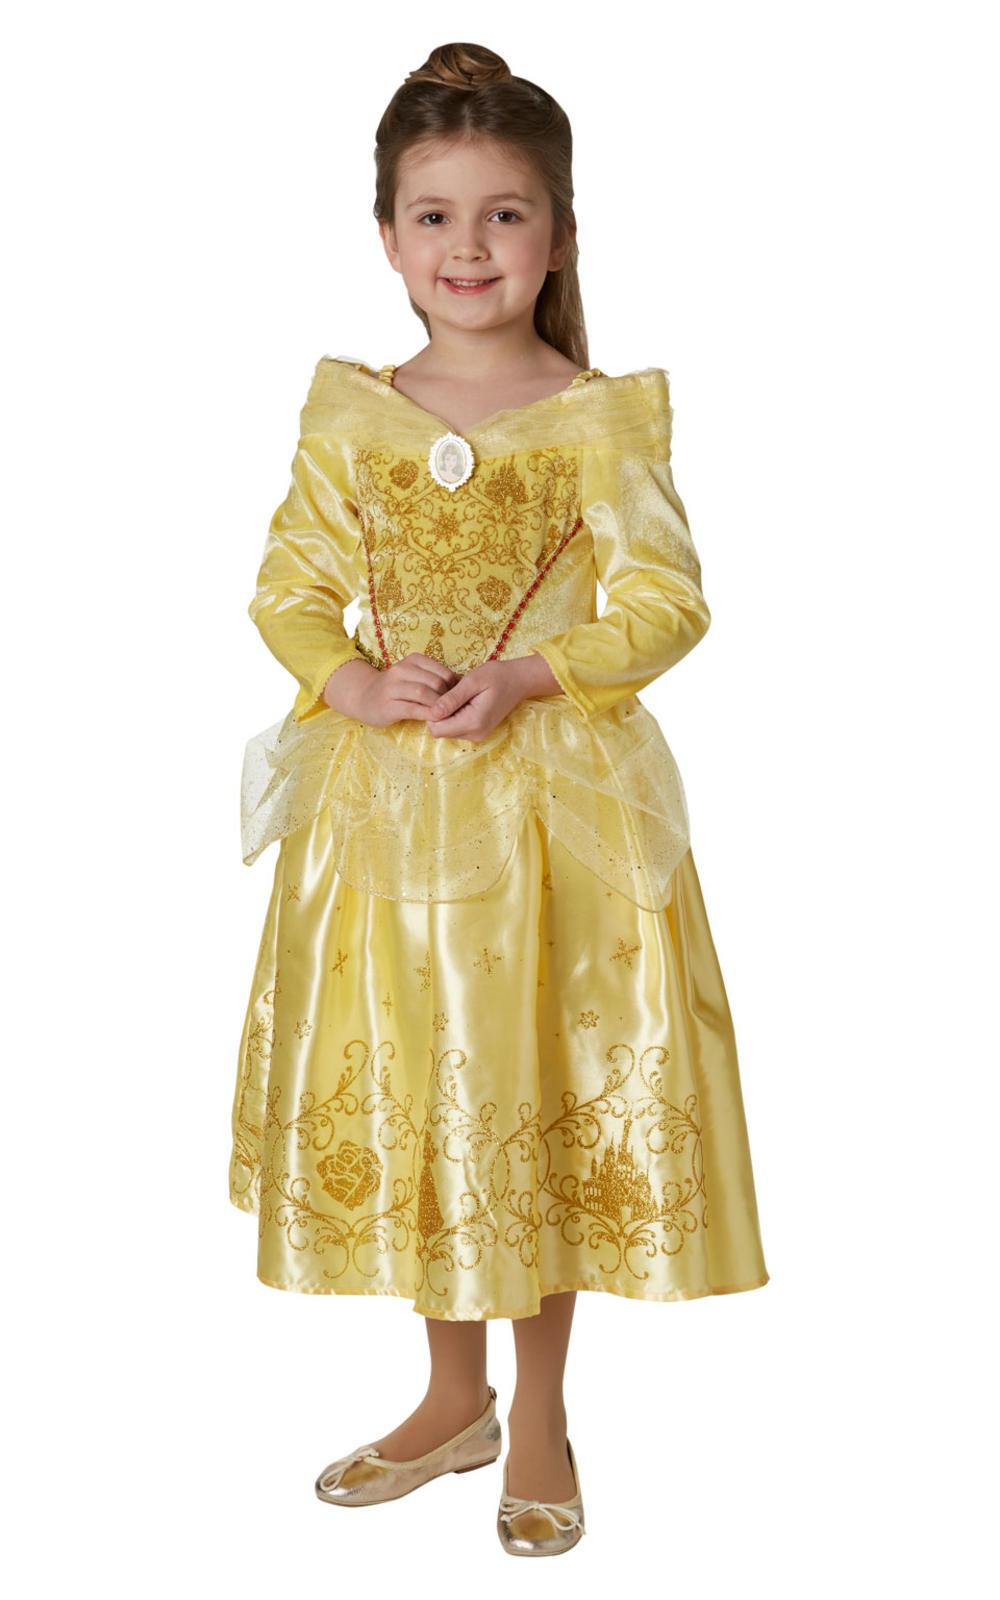 Winter Belle Girls Fancy Dress Disney Beauty and The Beast Childrens Kid Costume